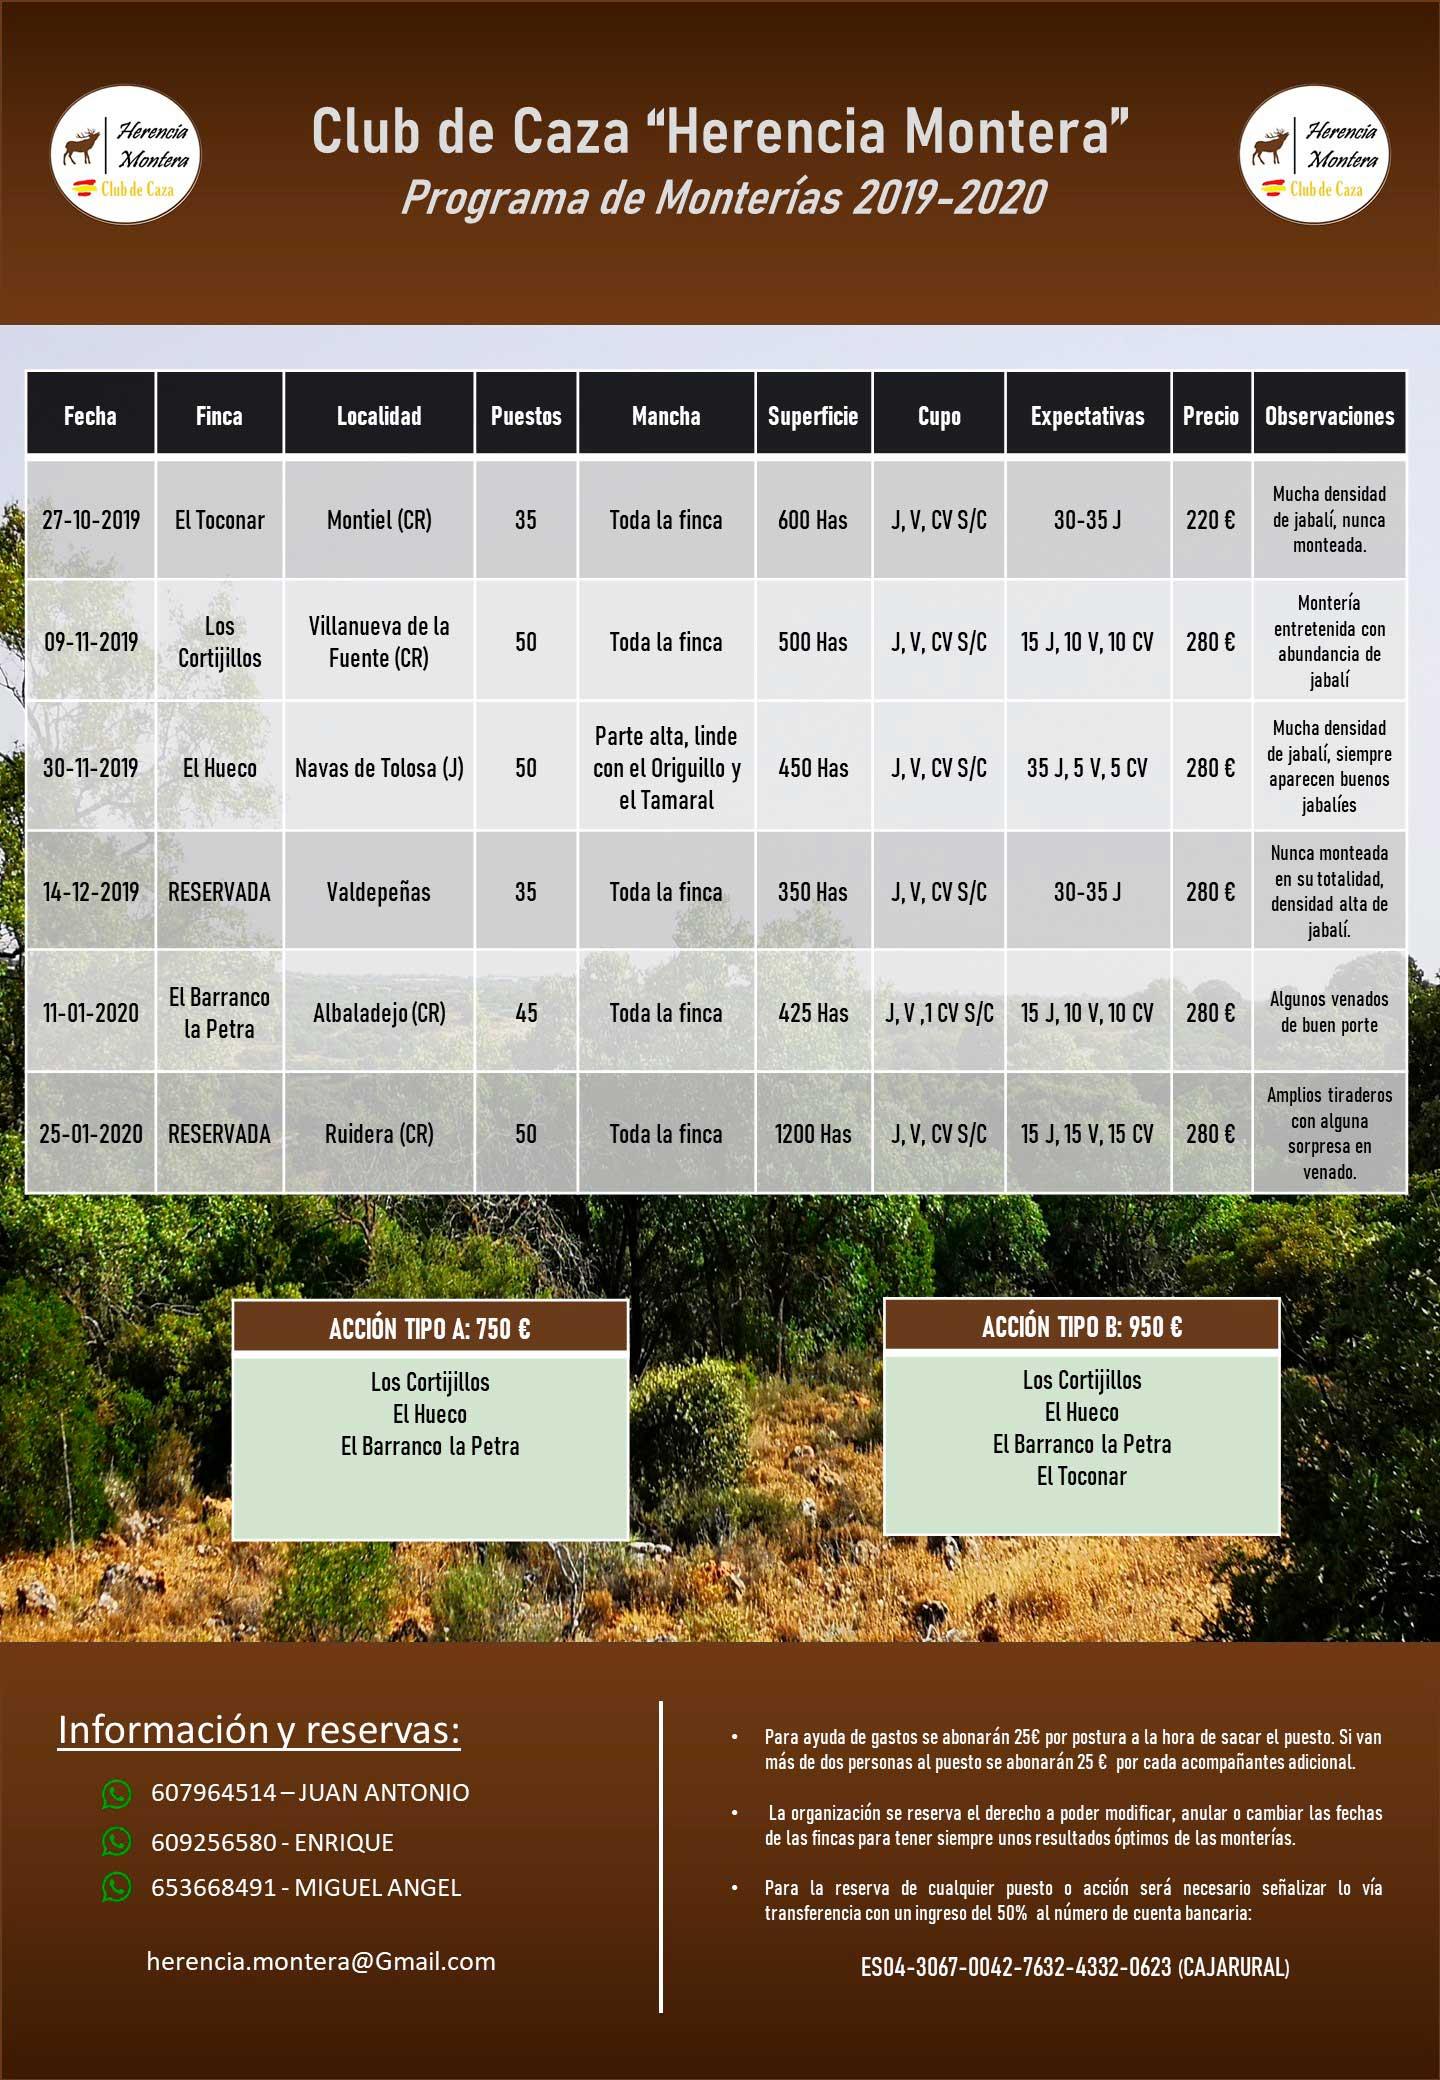 Programa Monterías Herencia Montera